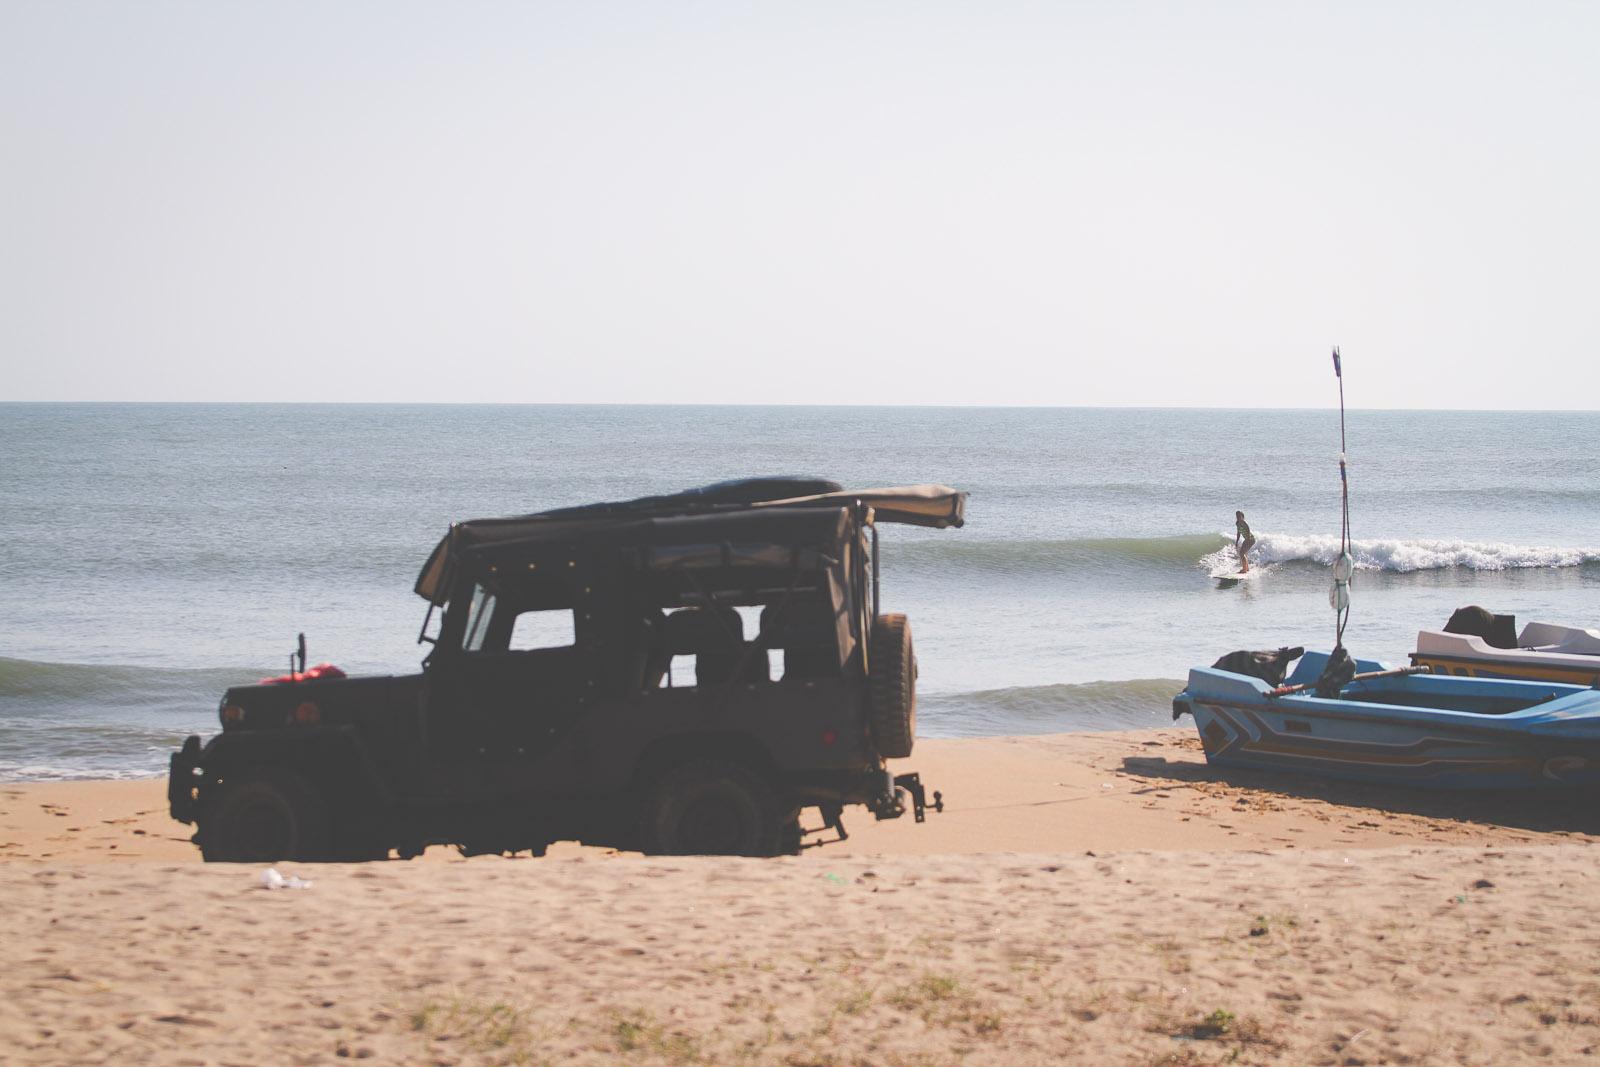 Sunshinestories-surf-travel-blog-IMG_9400